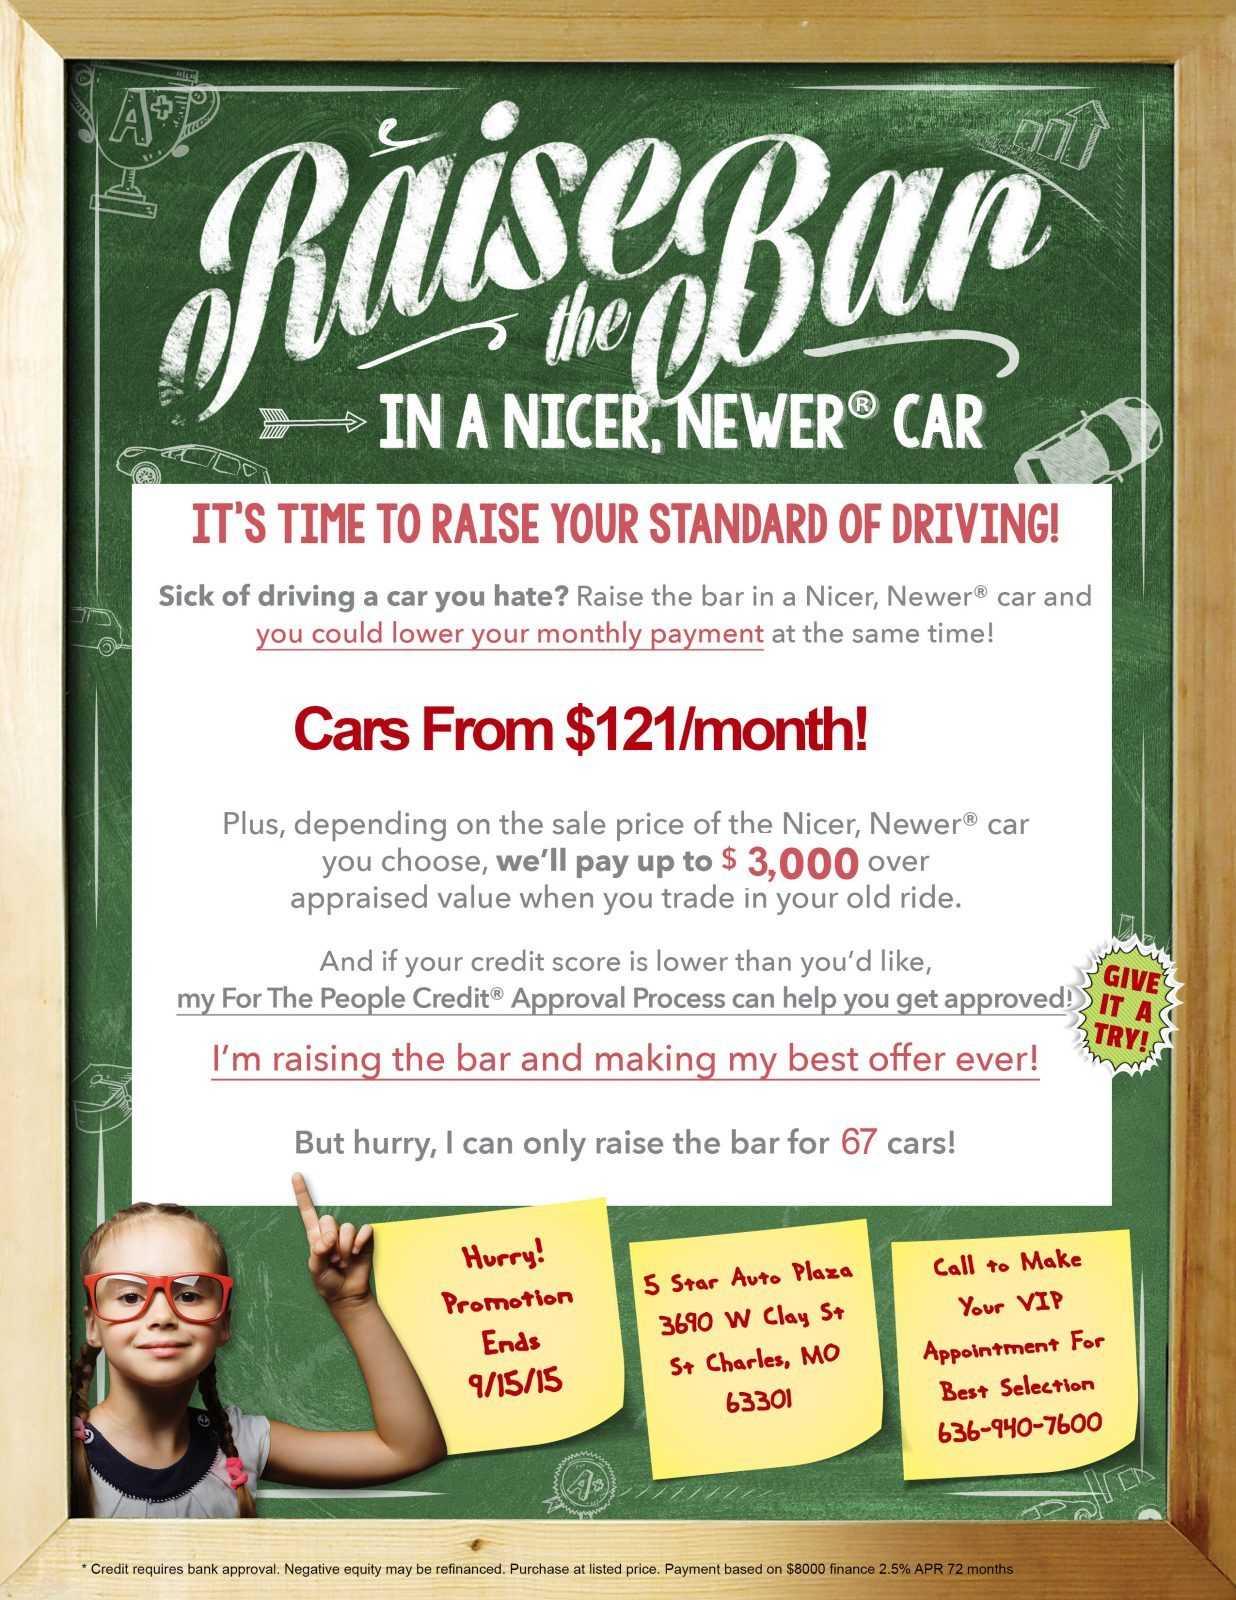 Raise the Bar At 5 Star Auto Plaza!